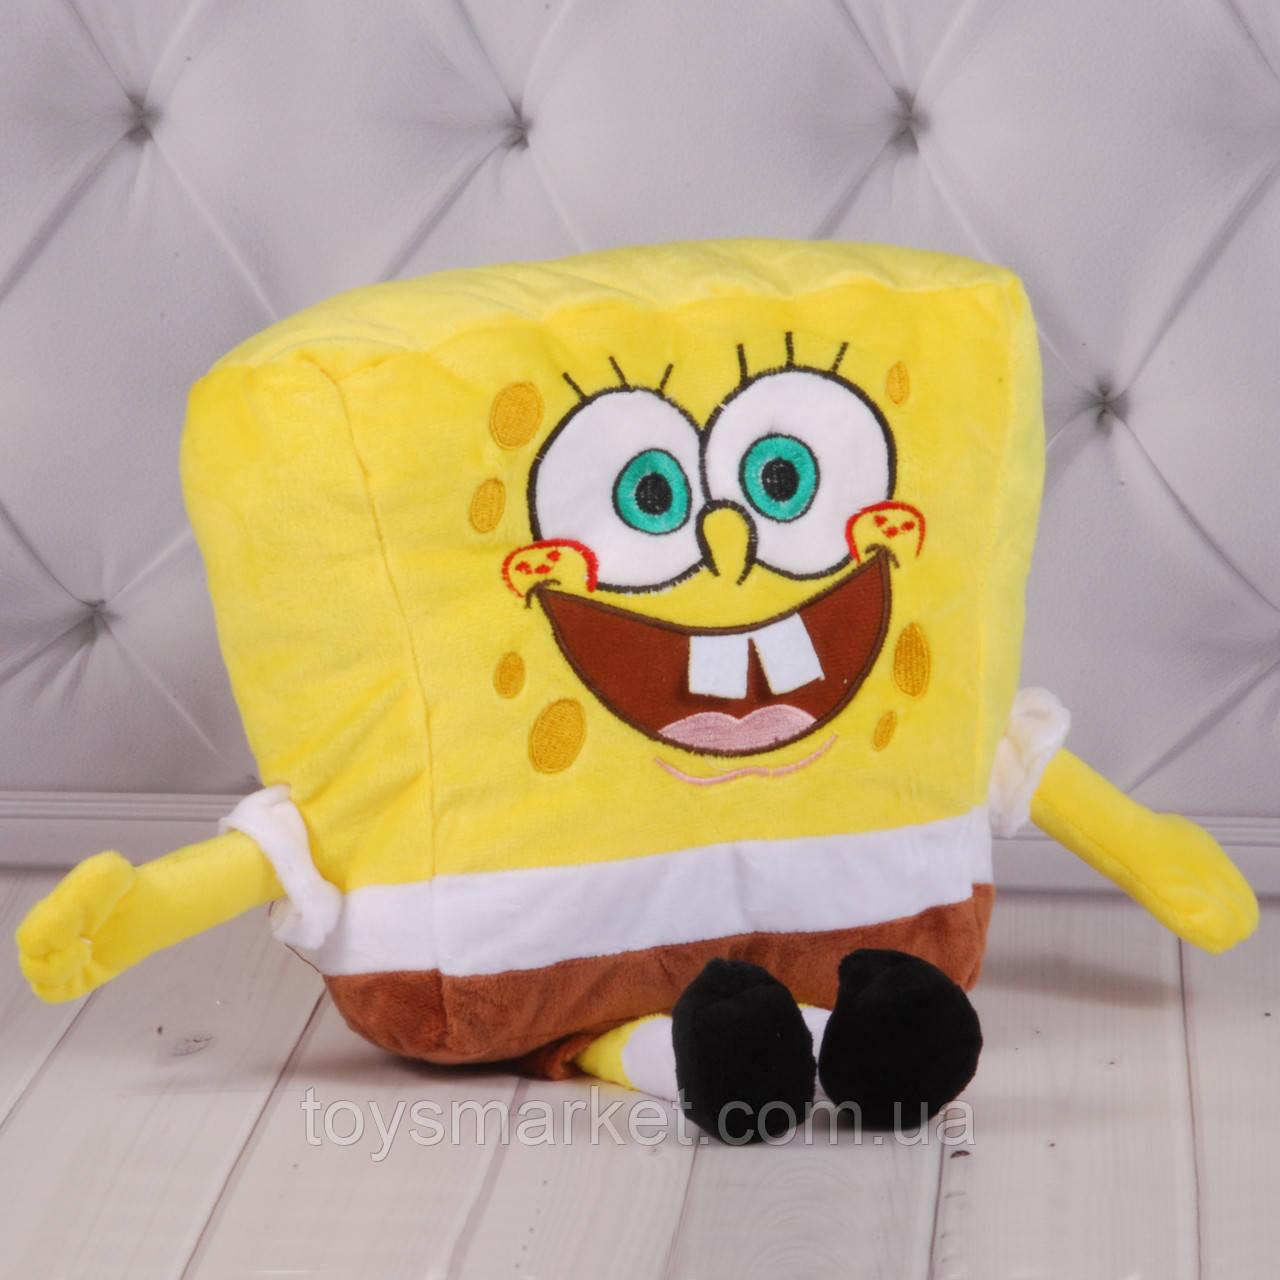 Мягкая игрушка Губка Боб, Sponge Bob